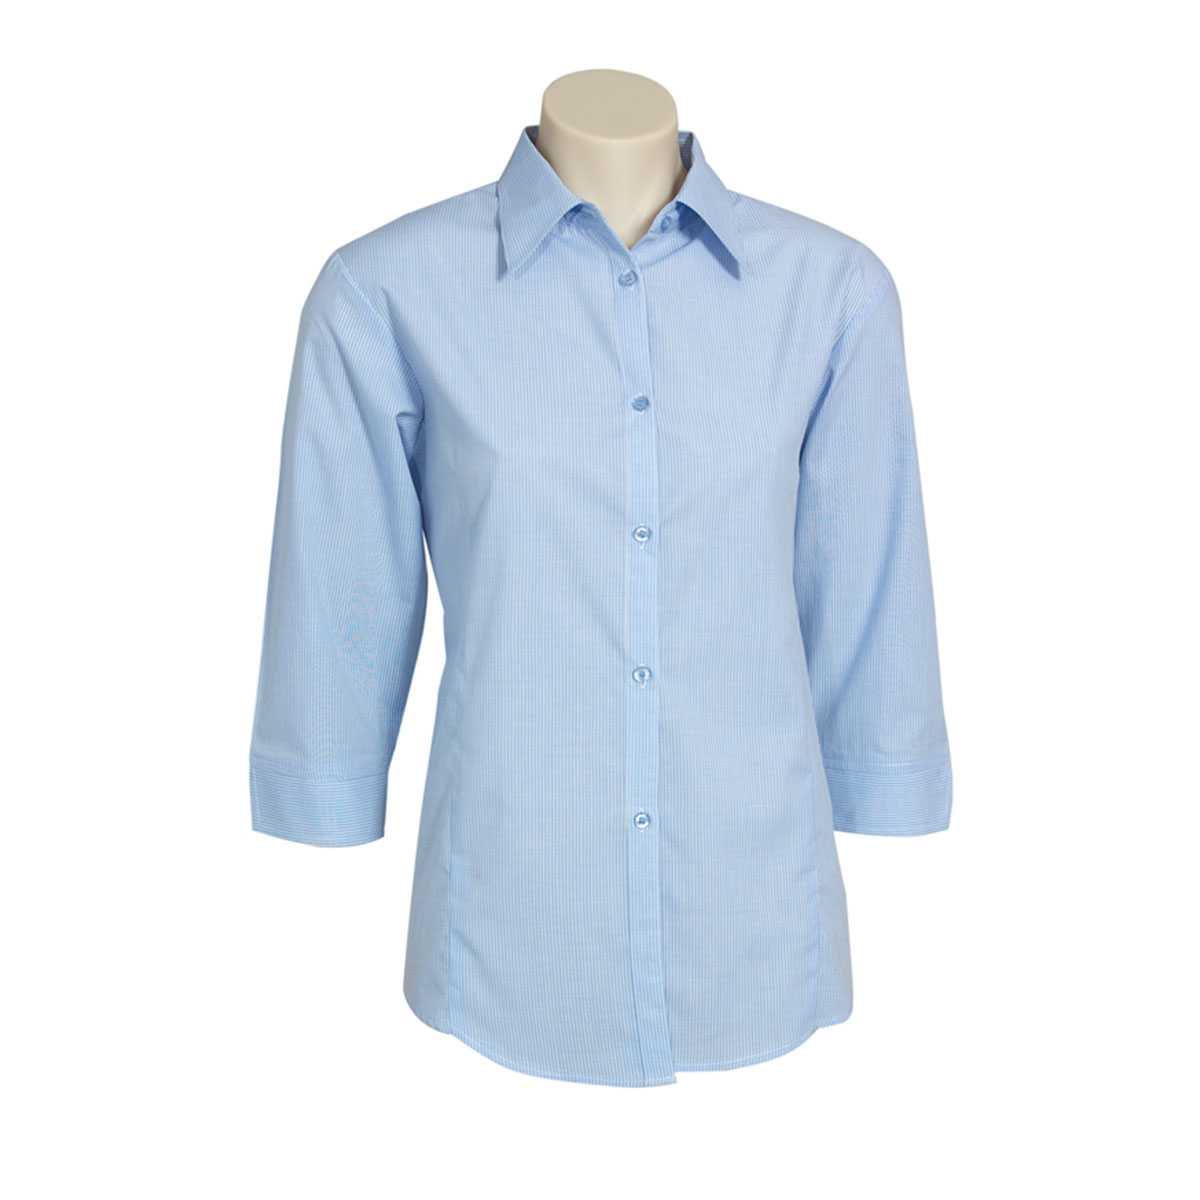 Ladies Micro Check 3/4 Sleeve Shirt-Sky